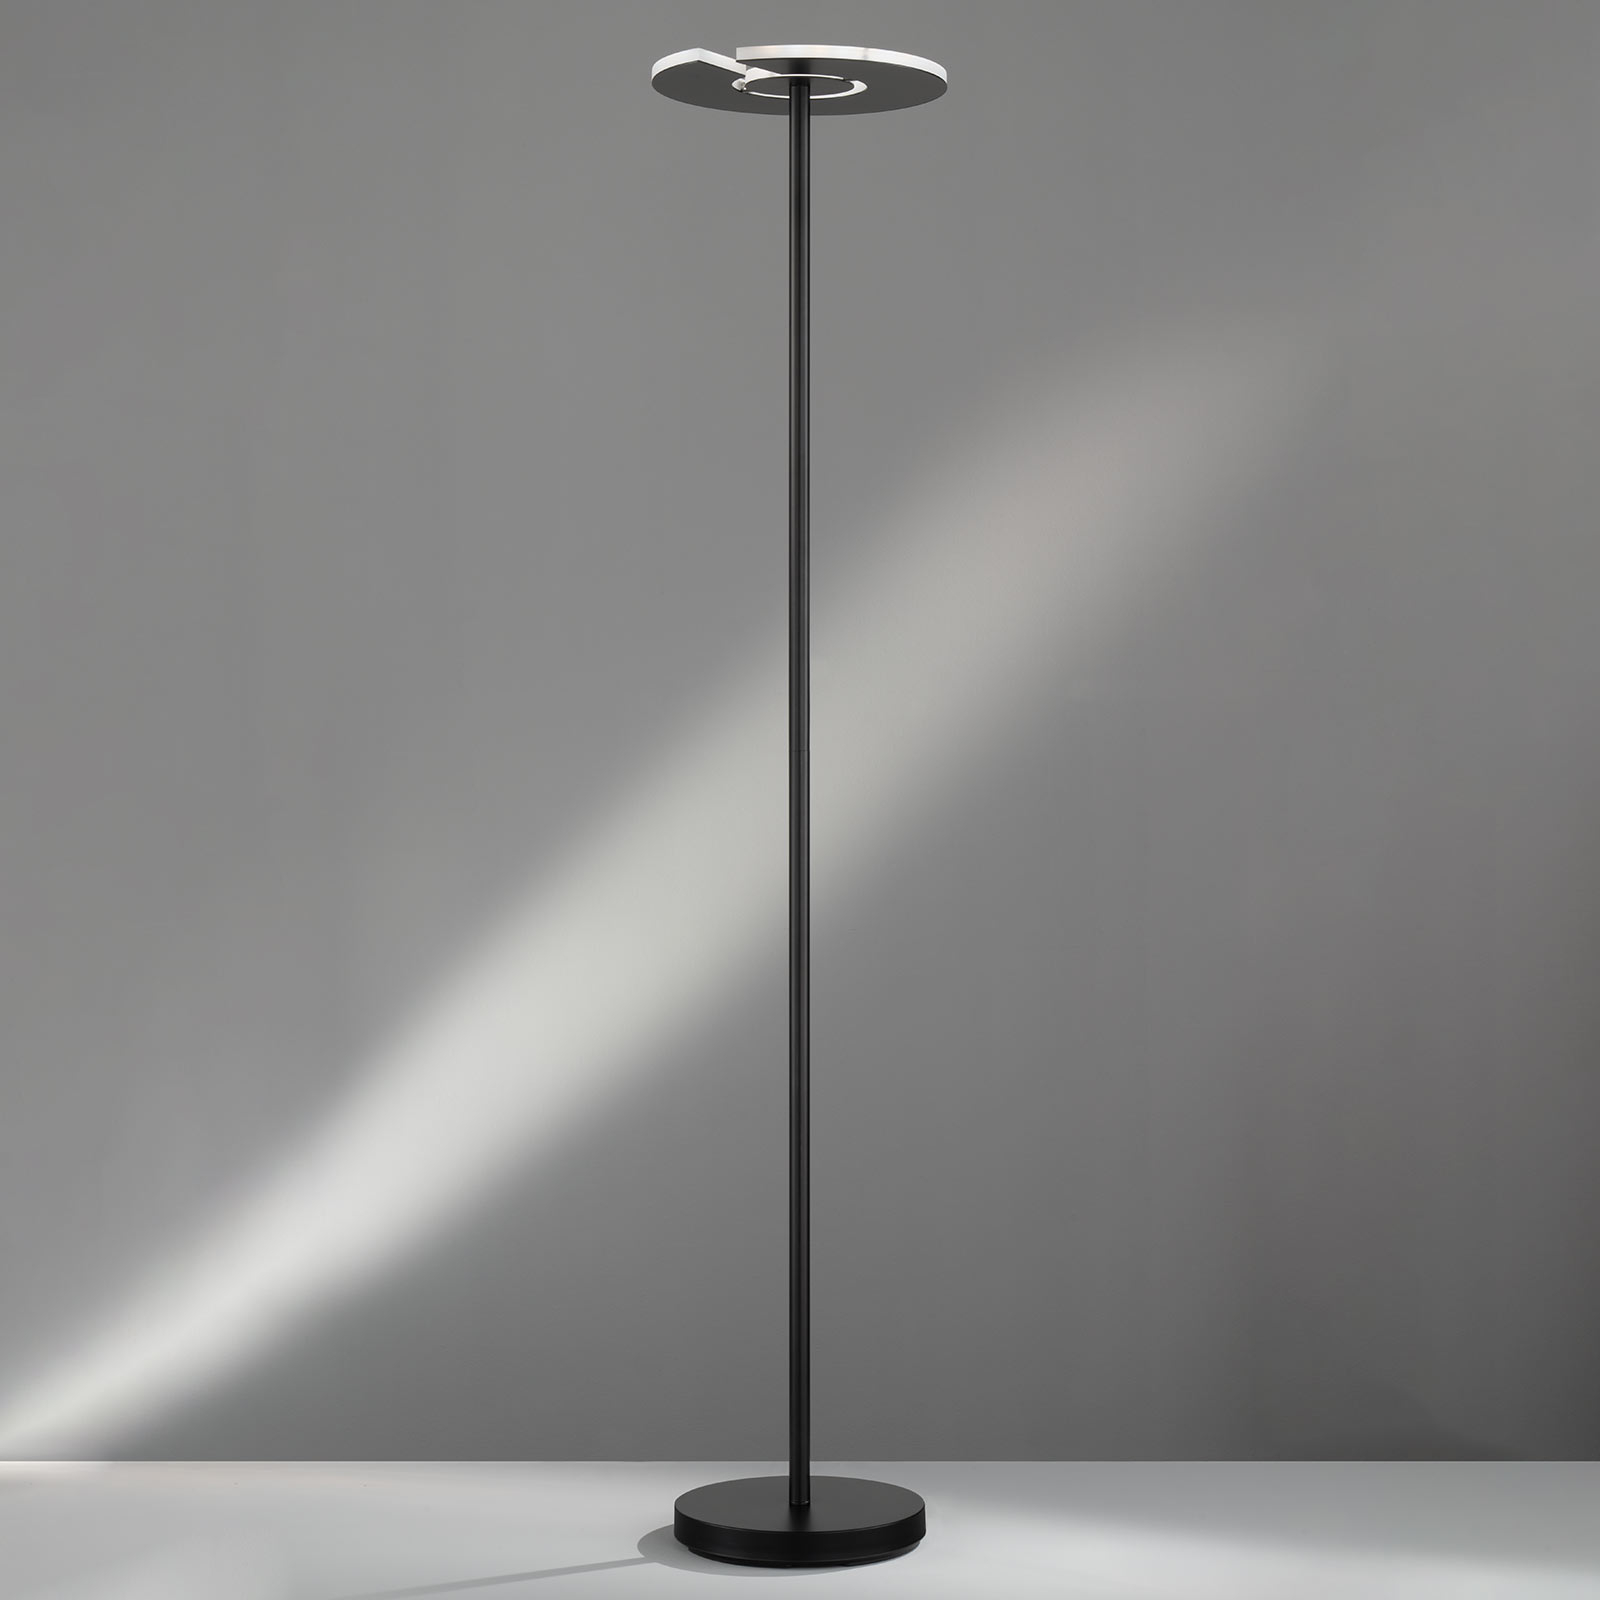 Lampe indirecte LED Dent, Tunable White, noir mat